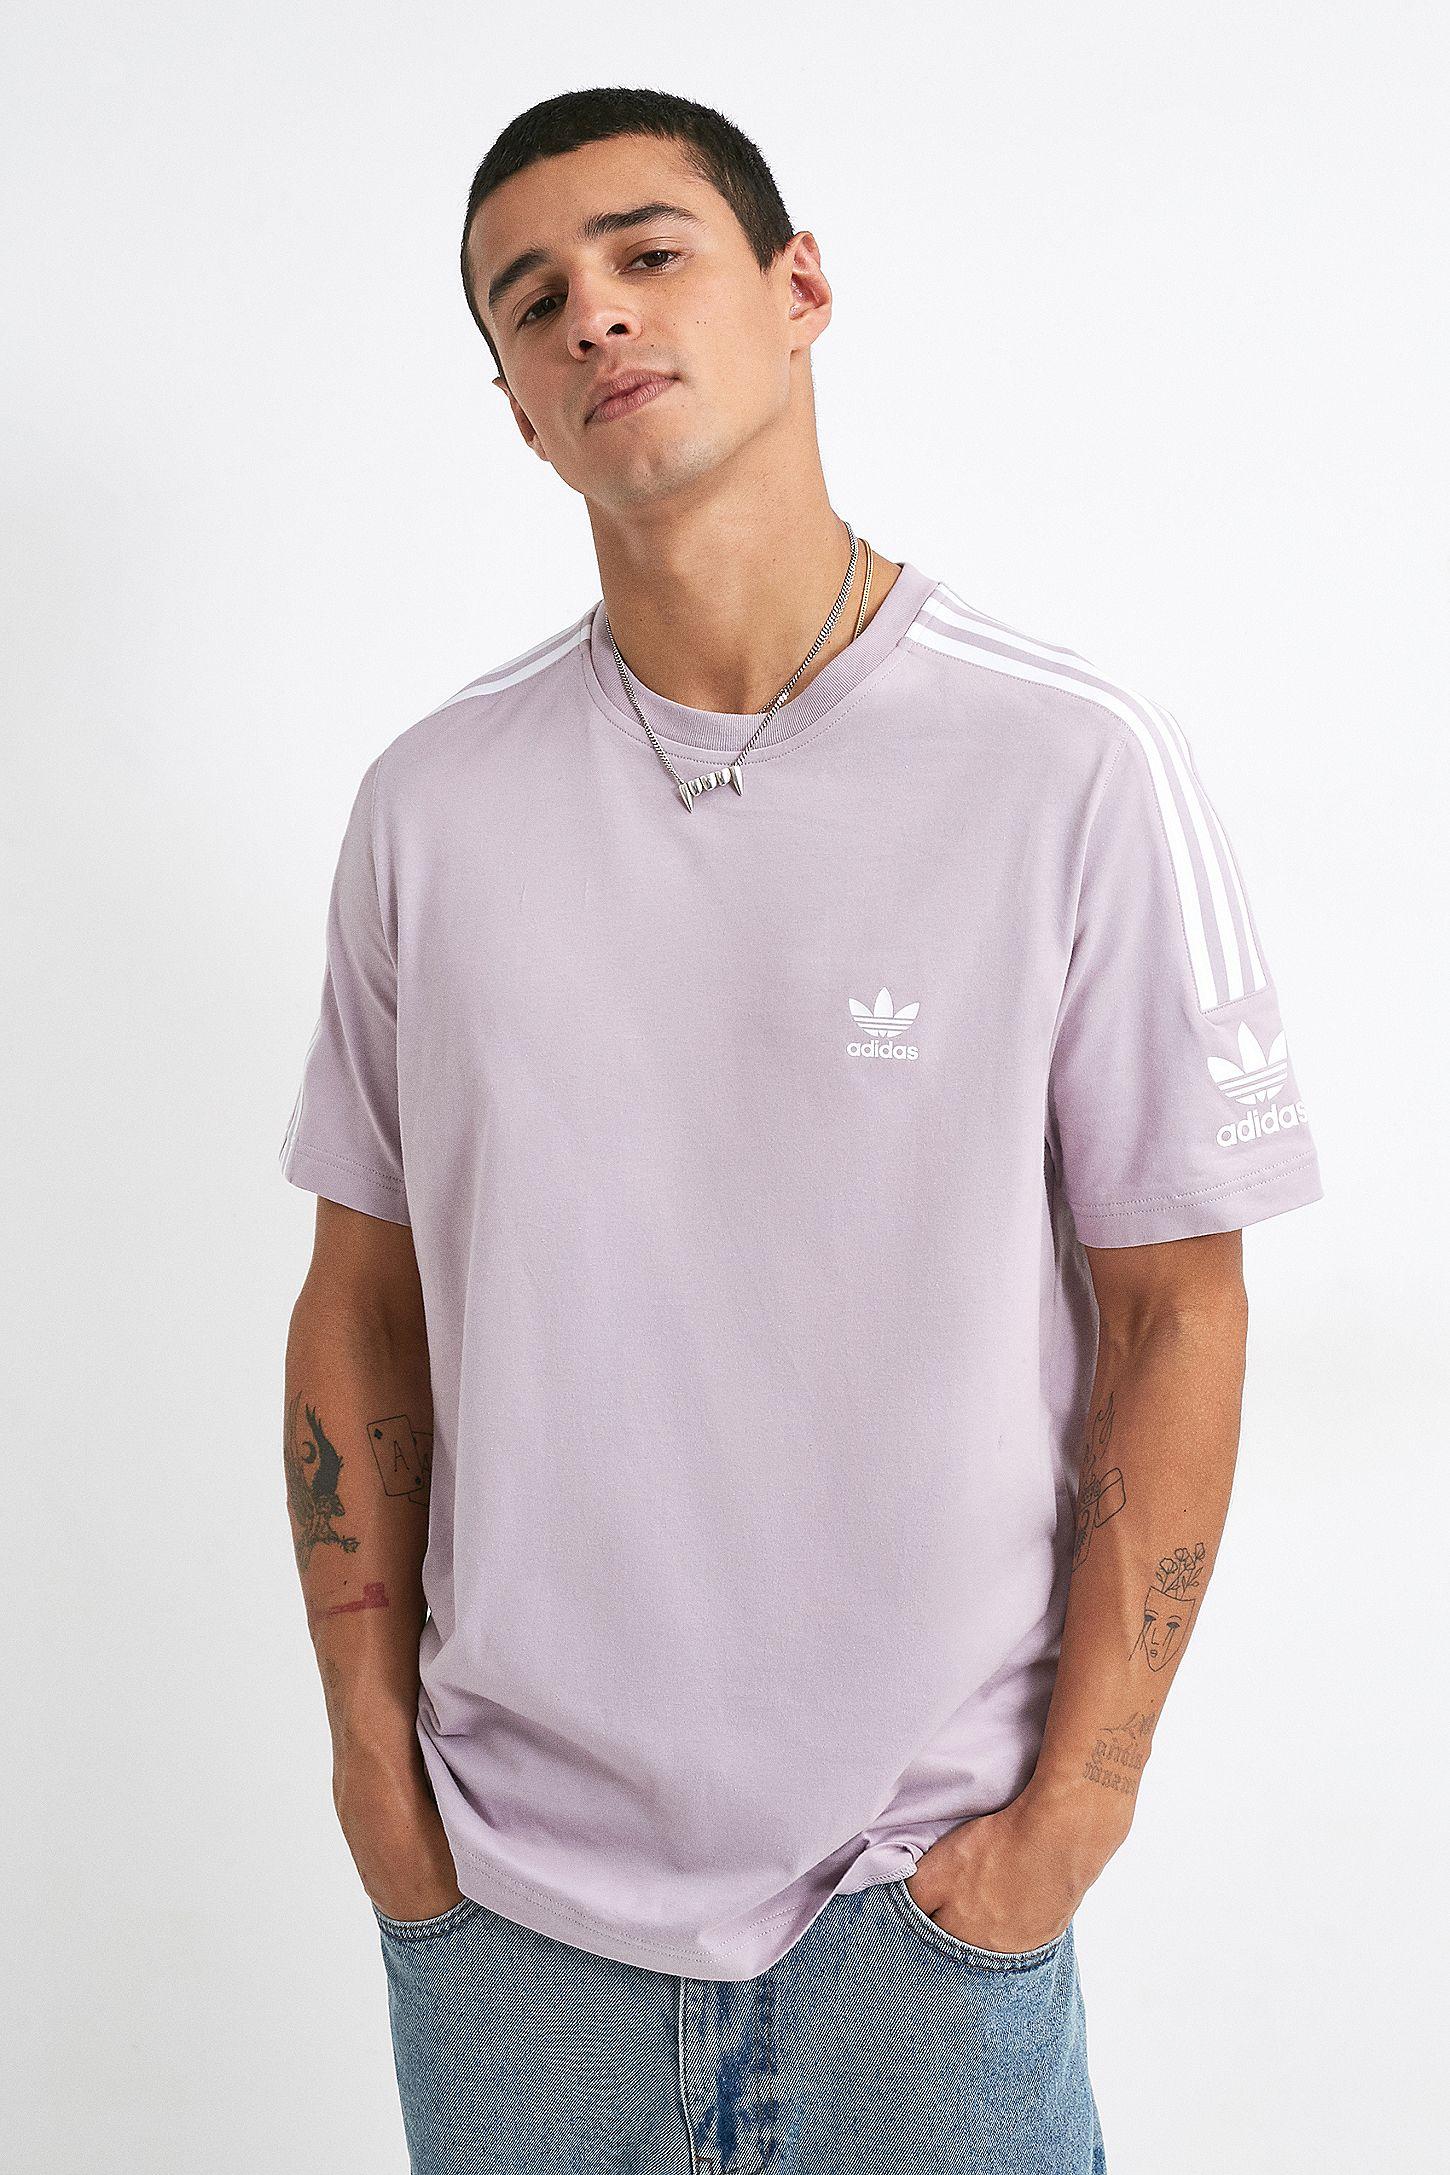 adidas t-shirt 3 stripes soft vision